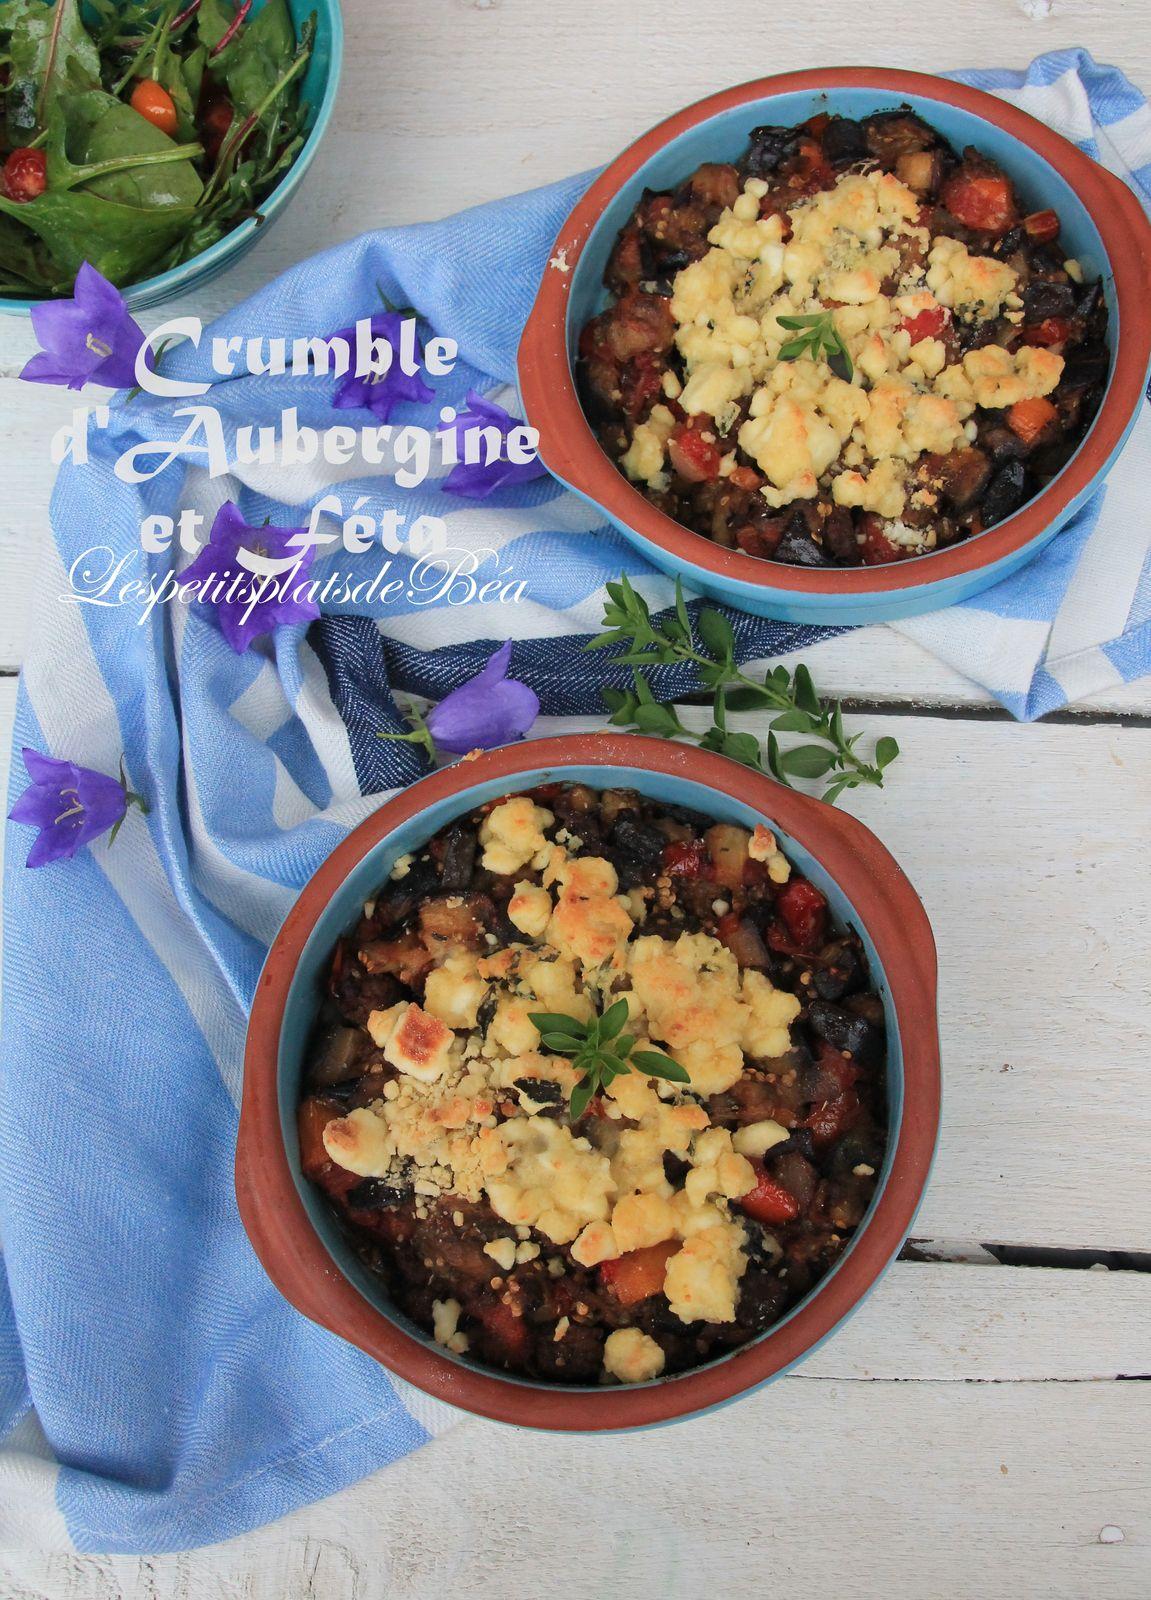 Crumble d'aubergine et féta